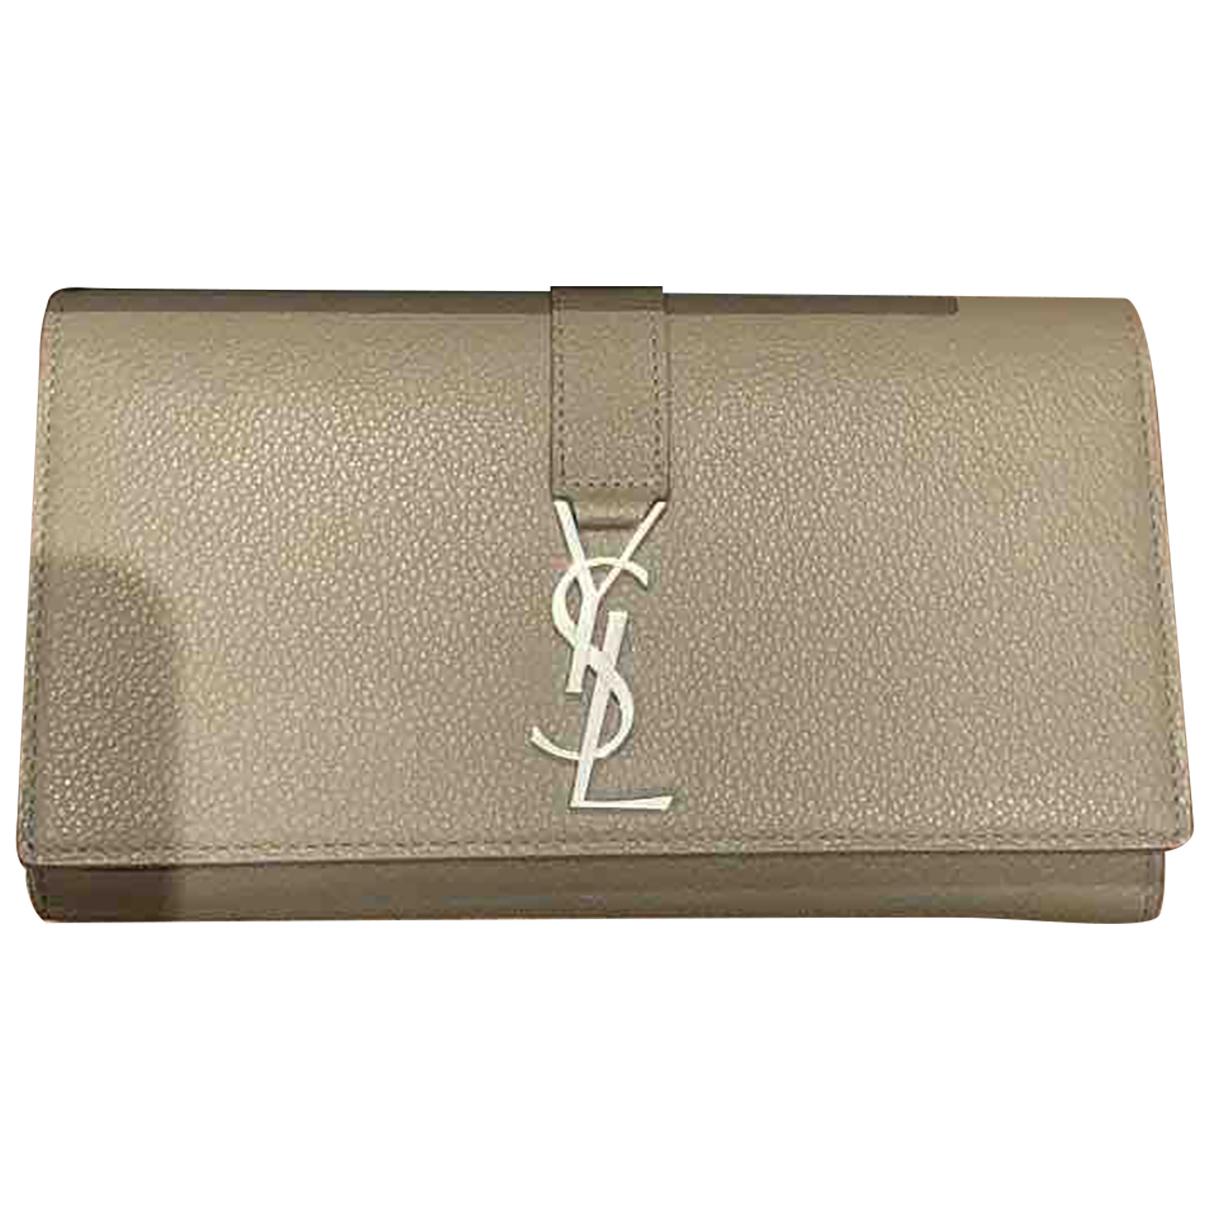 Saint Laurent Ysl line Beige Leather wallet for Women N